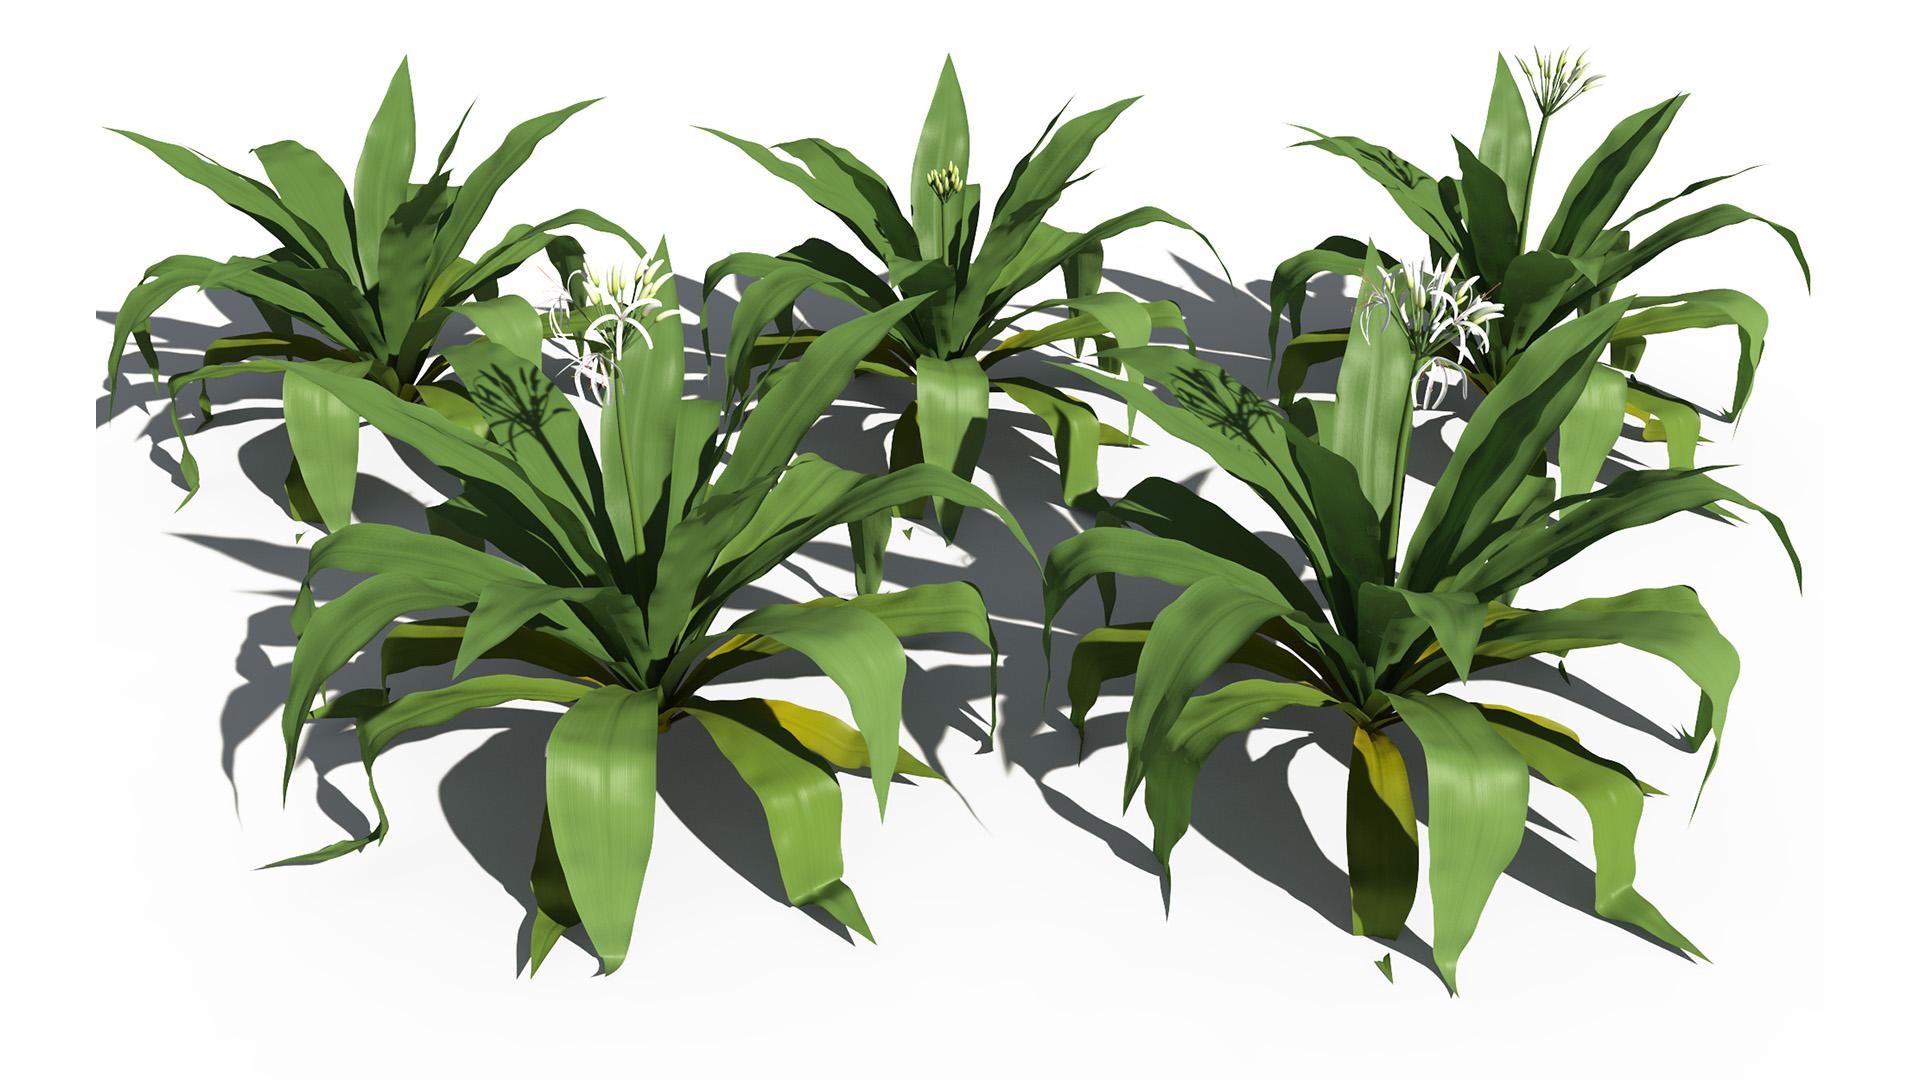 3D model of the Spider lily Crinum asiaticum season variations